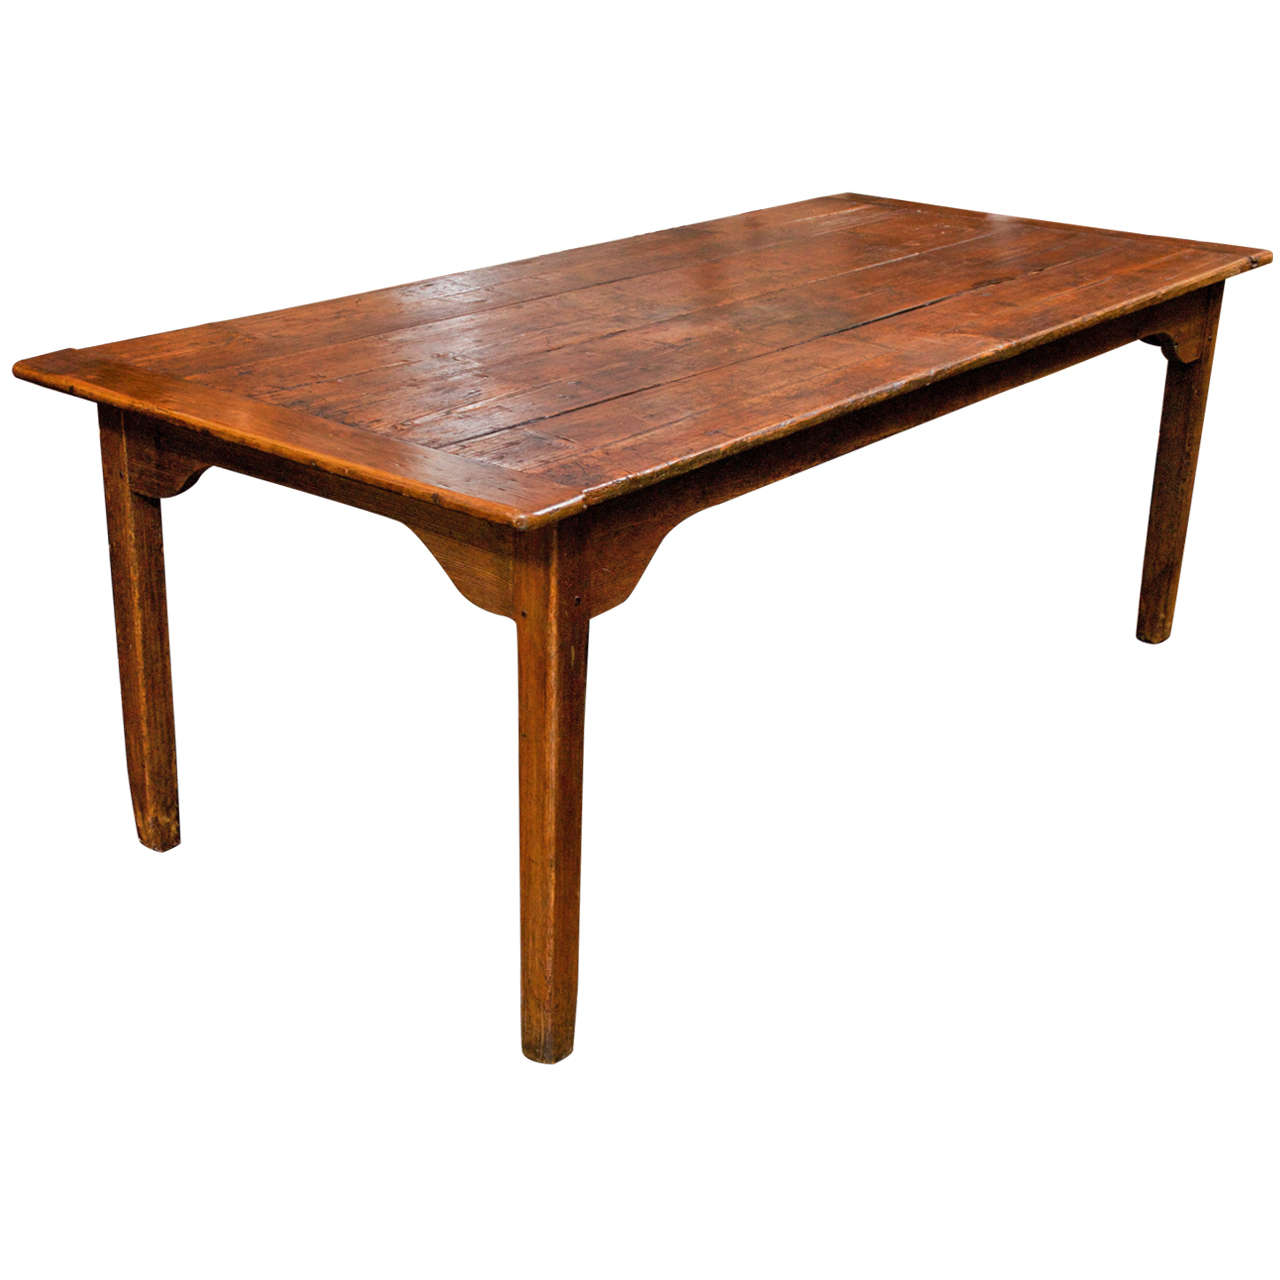 English farmhouse table circa 1850 at 1stdibs for England table